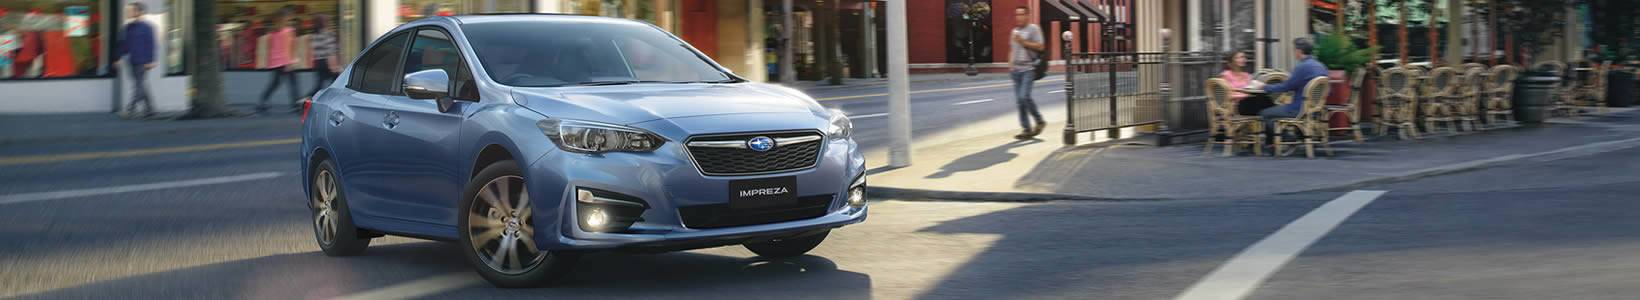 Subaru_Impreza_2017